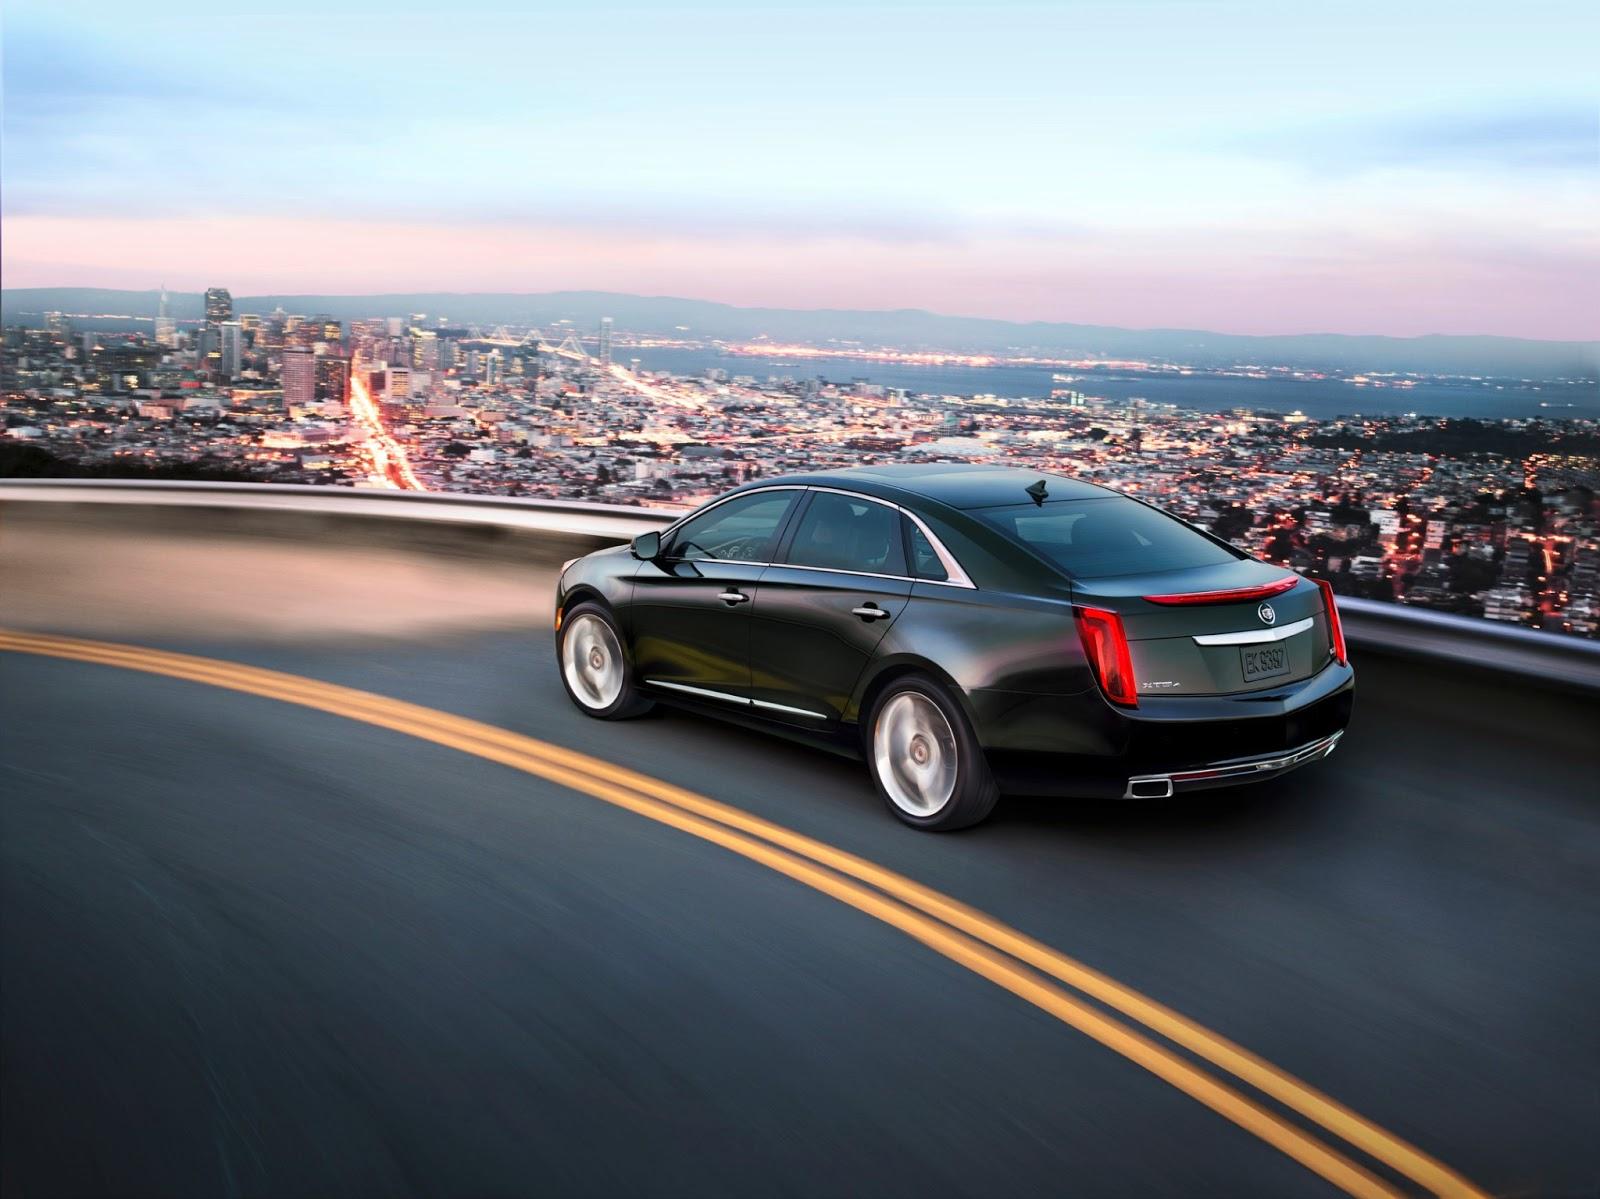 http://3.bp.blogspot.com/-5QN76dq9vhQ/UT5lmx--FqI/AAAAAAAAj0s/nobFV-nzZHA/s1600/2013+Cadillac+XTS+Platinum+Collection.jpg